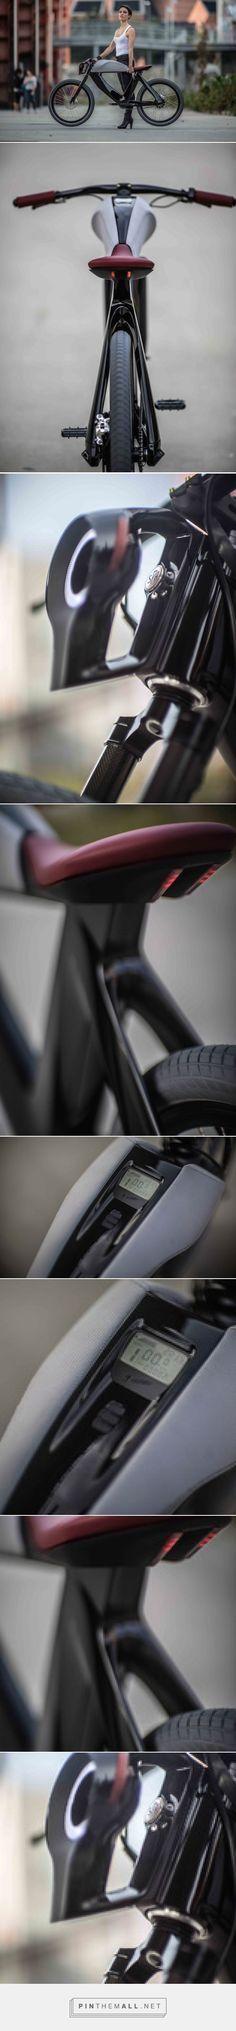 Black Electric Bike – Fubiz Media - created via http://pinthemall.net